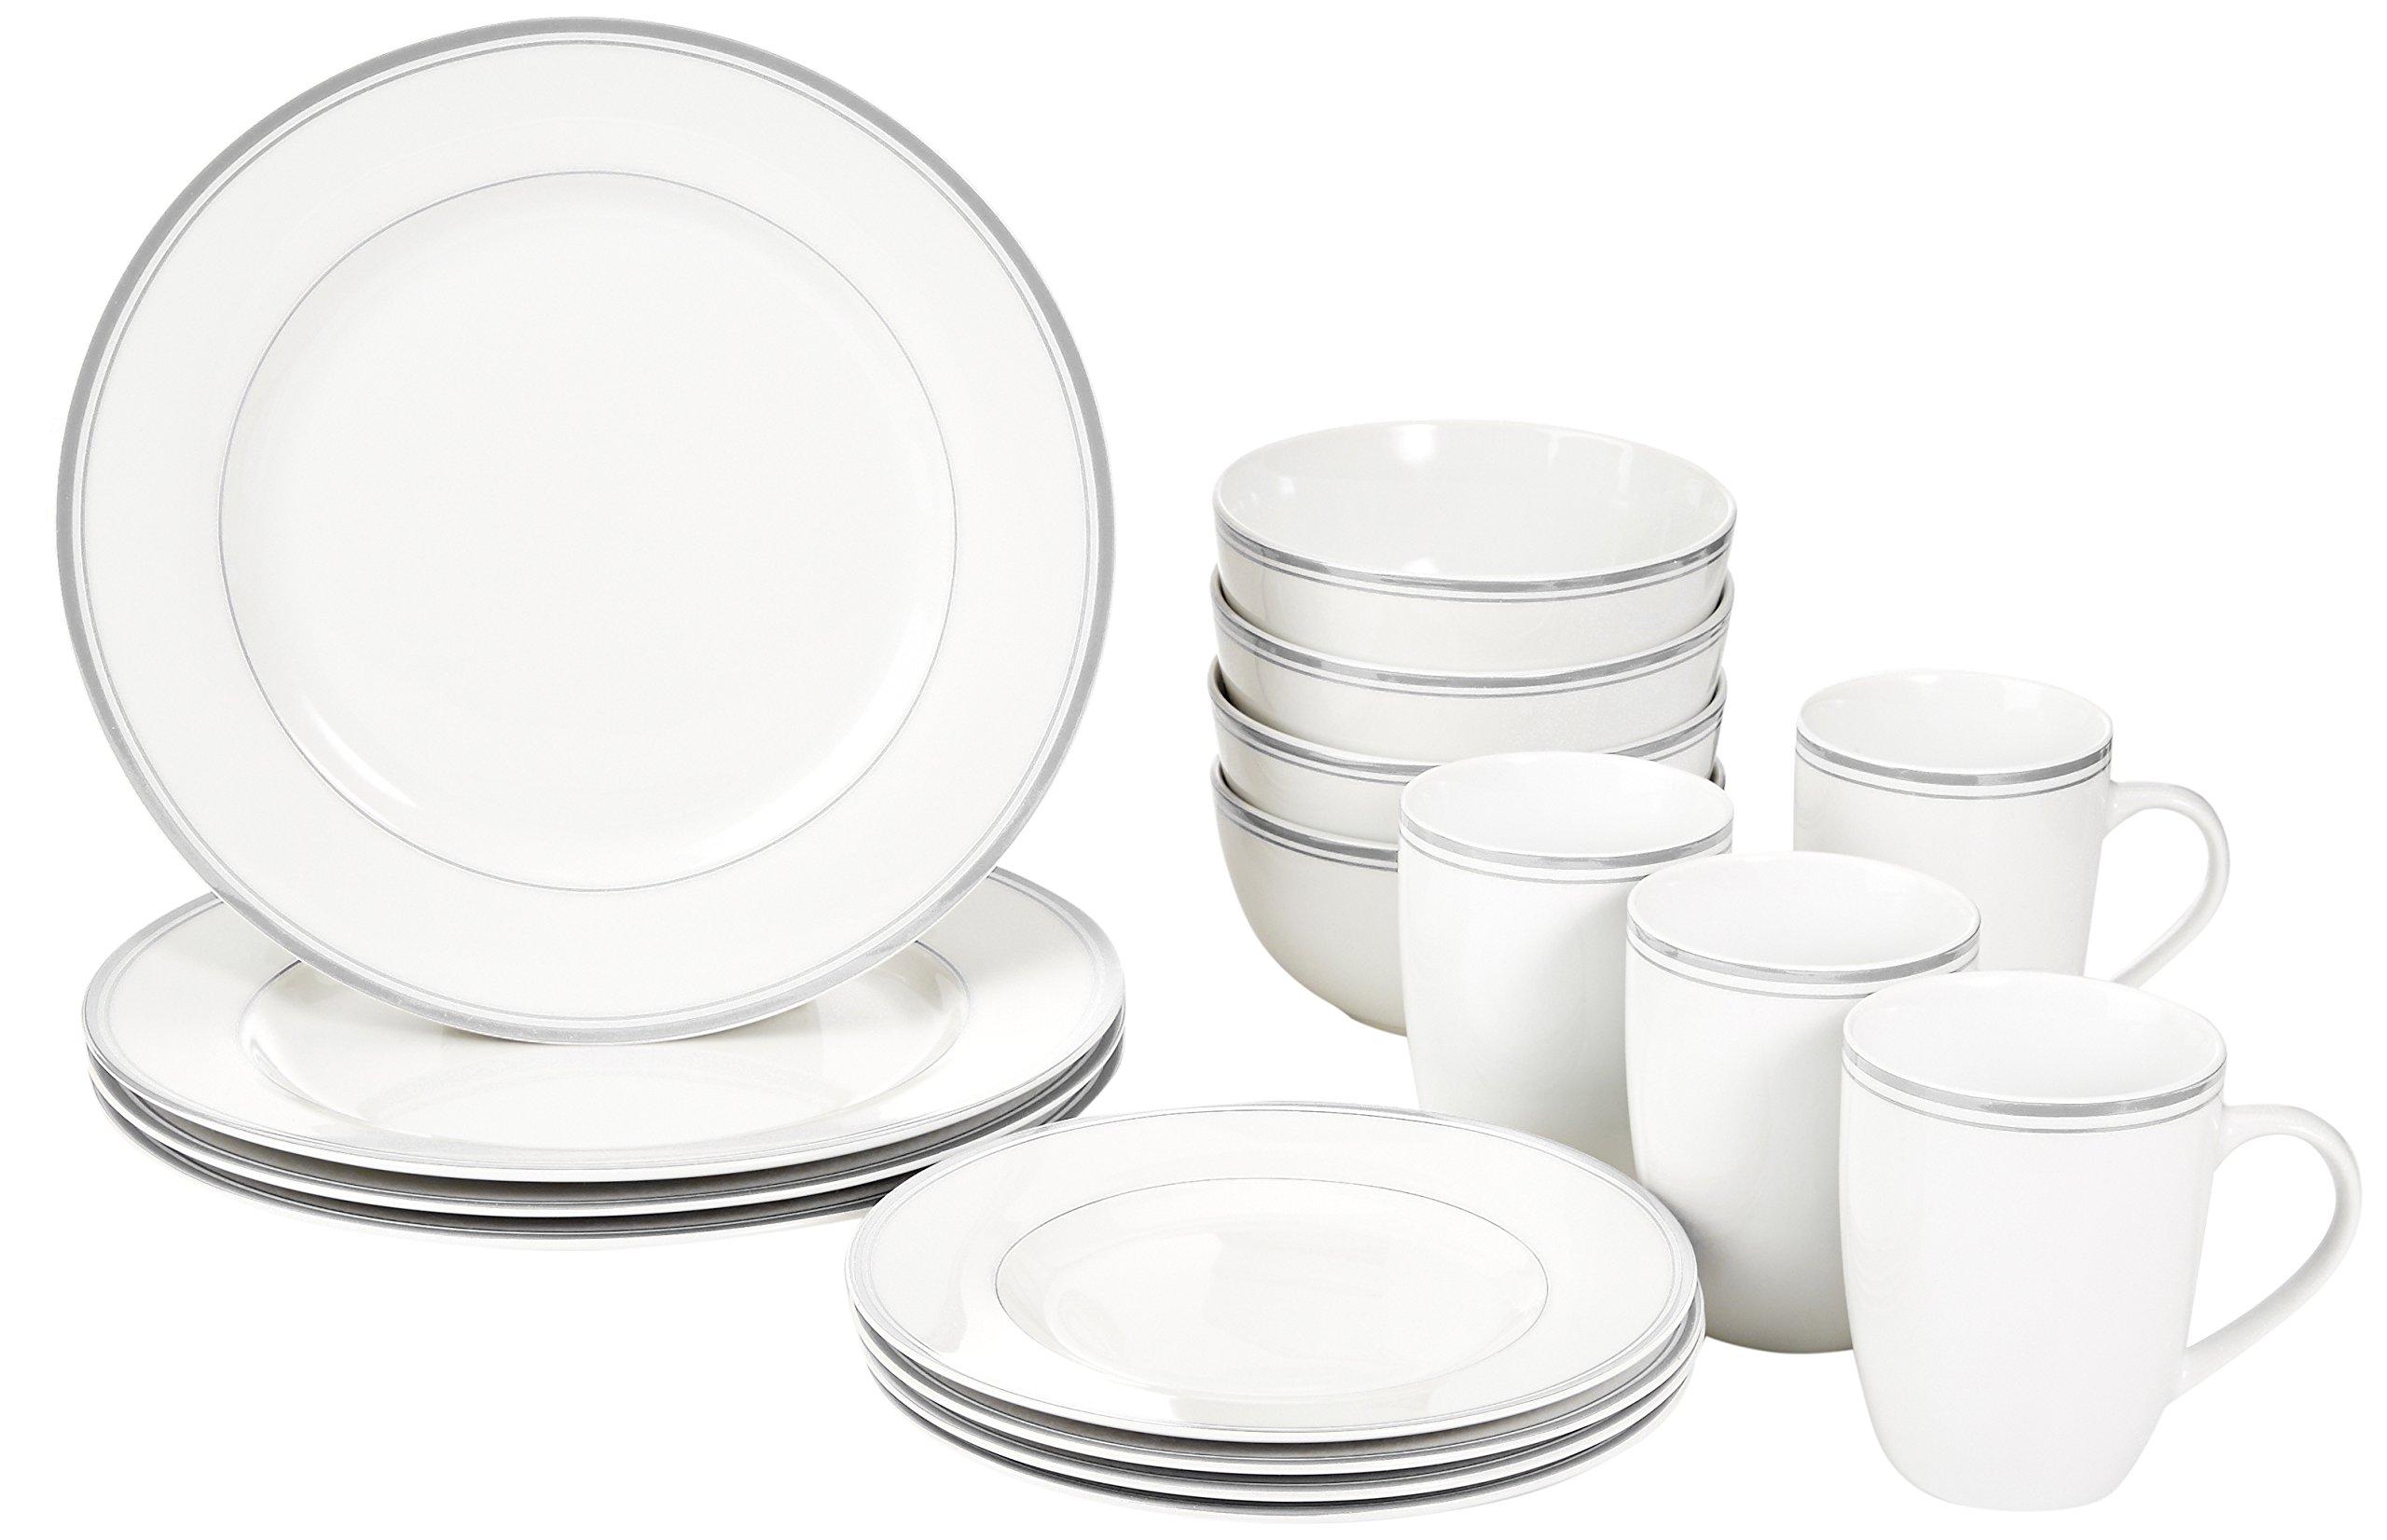 AmazonBasics 16-Piece Cafe Stripe Dinnerware Set, Service for 4 - Grey by AmazonBasics (Image #1)